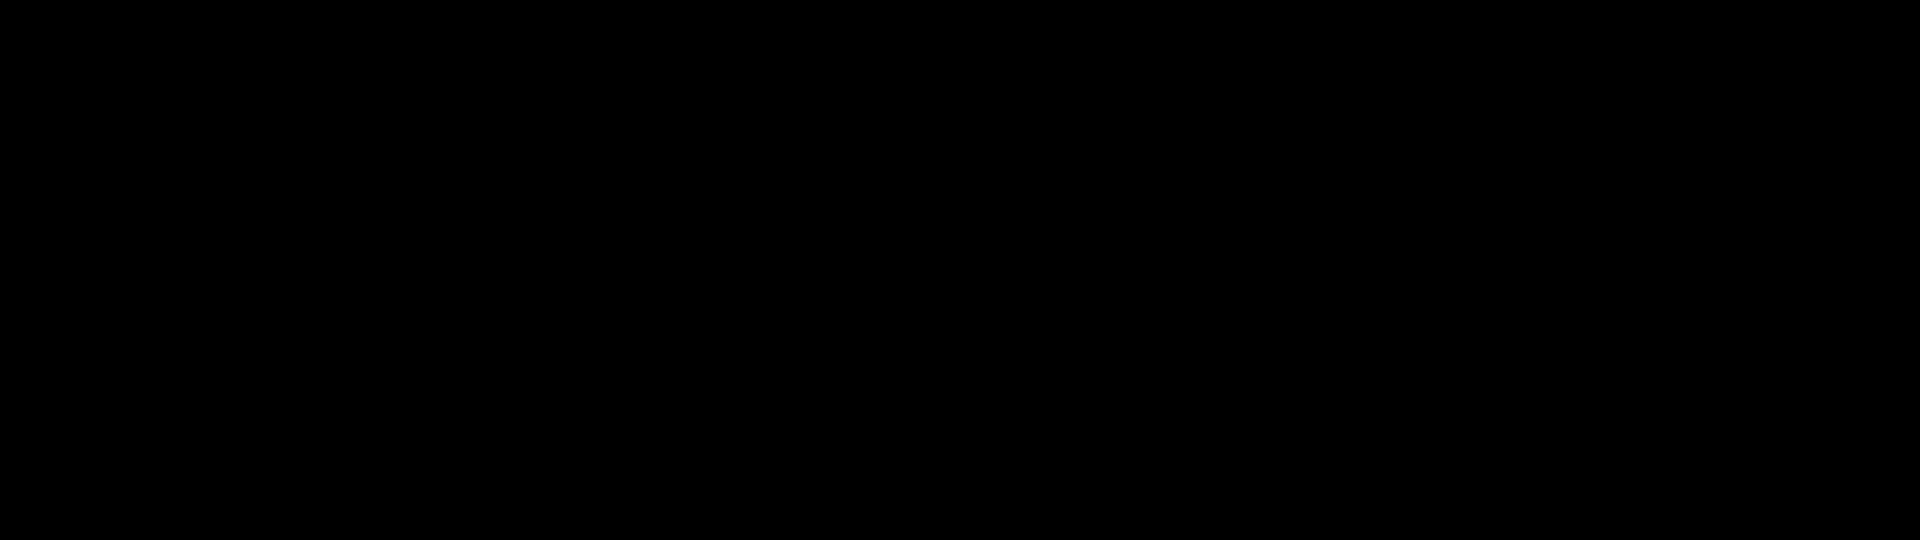 Type Specimen: Playfair Display, Raleway fonts